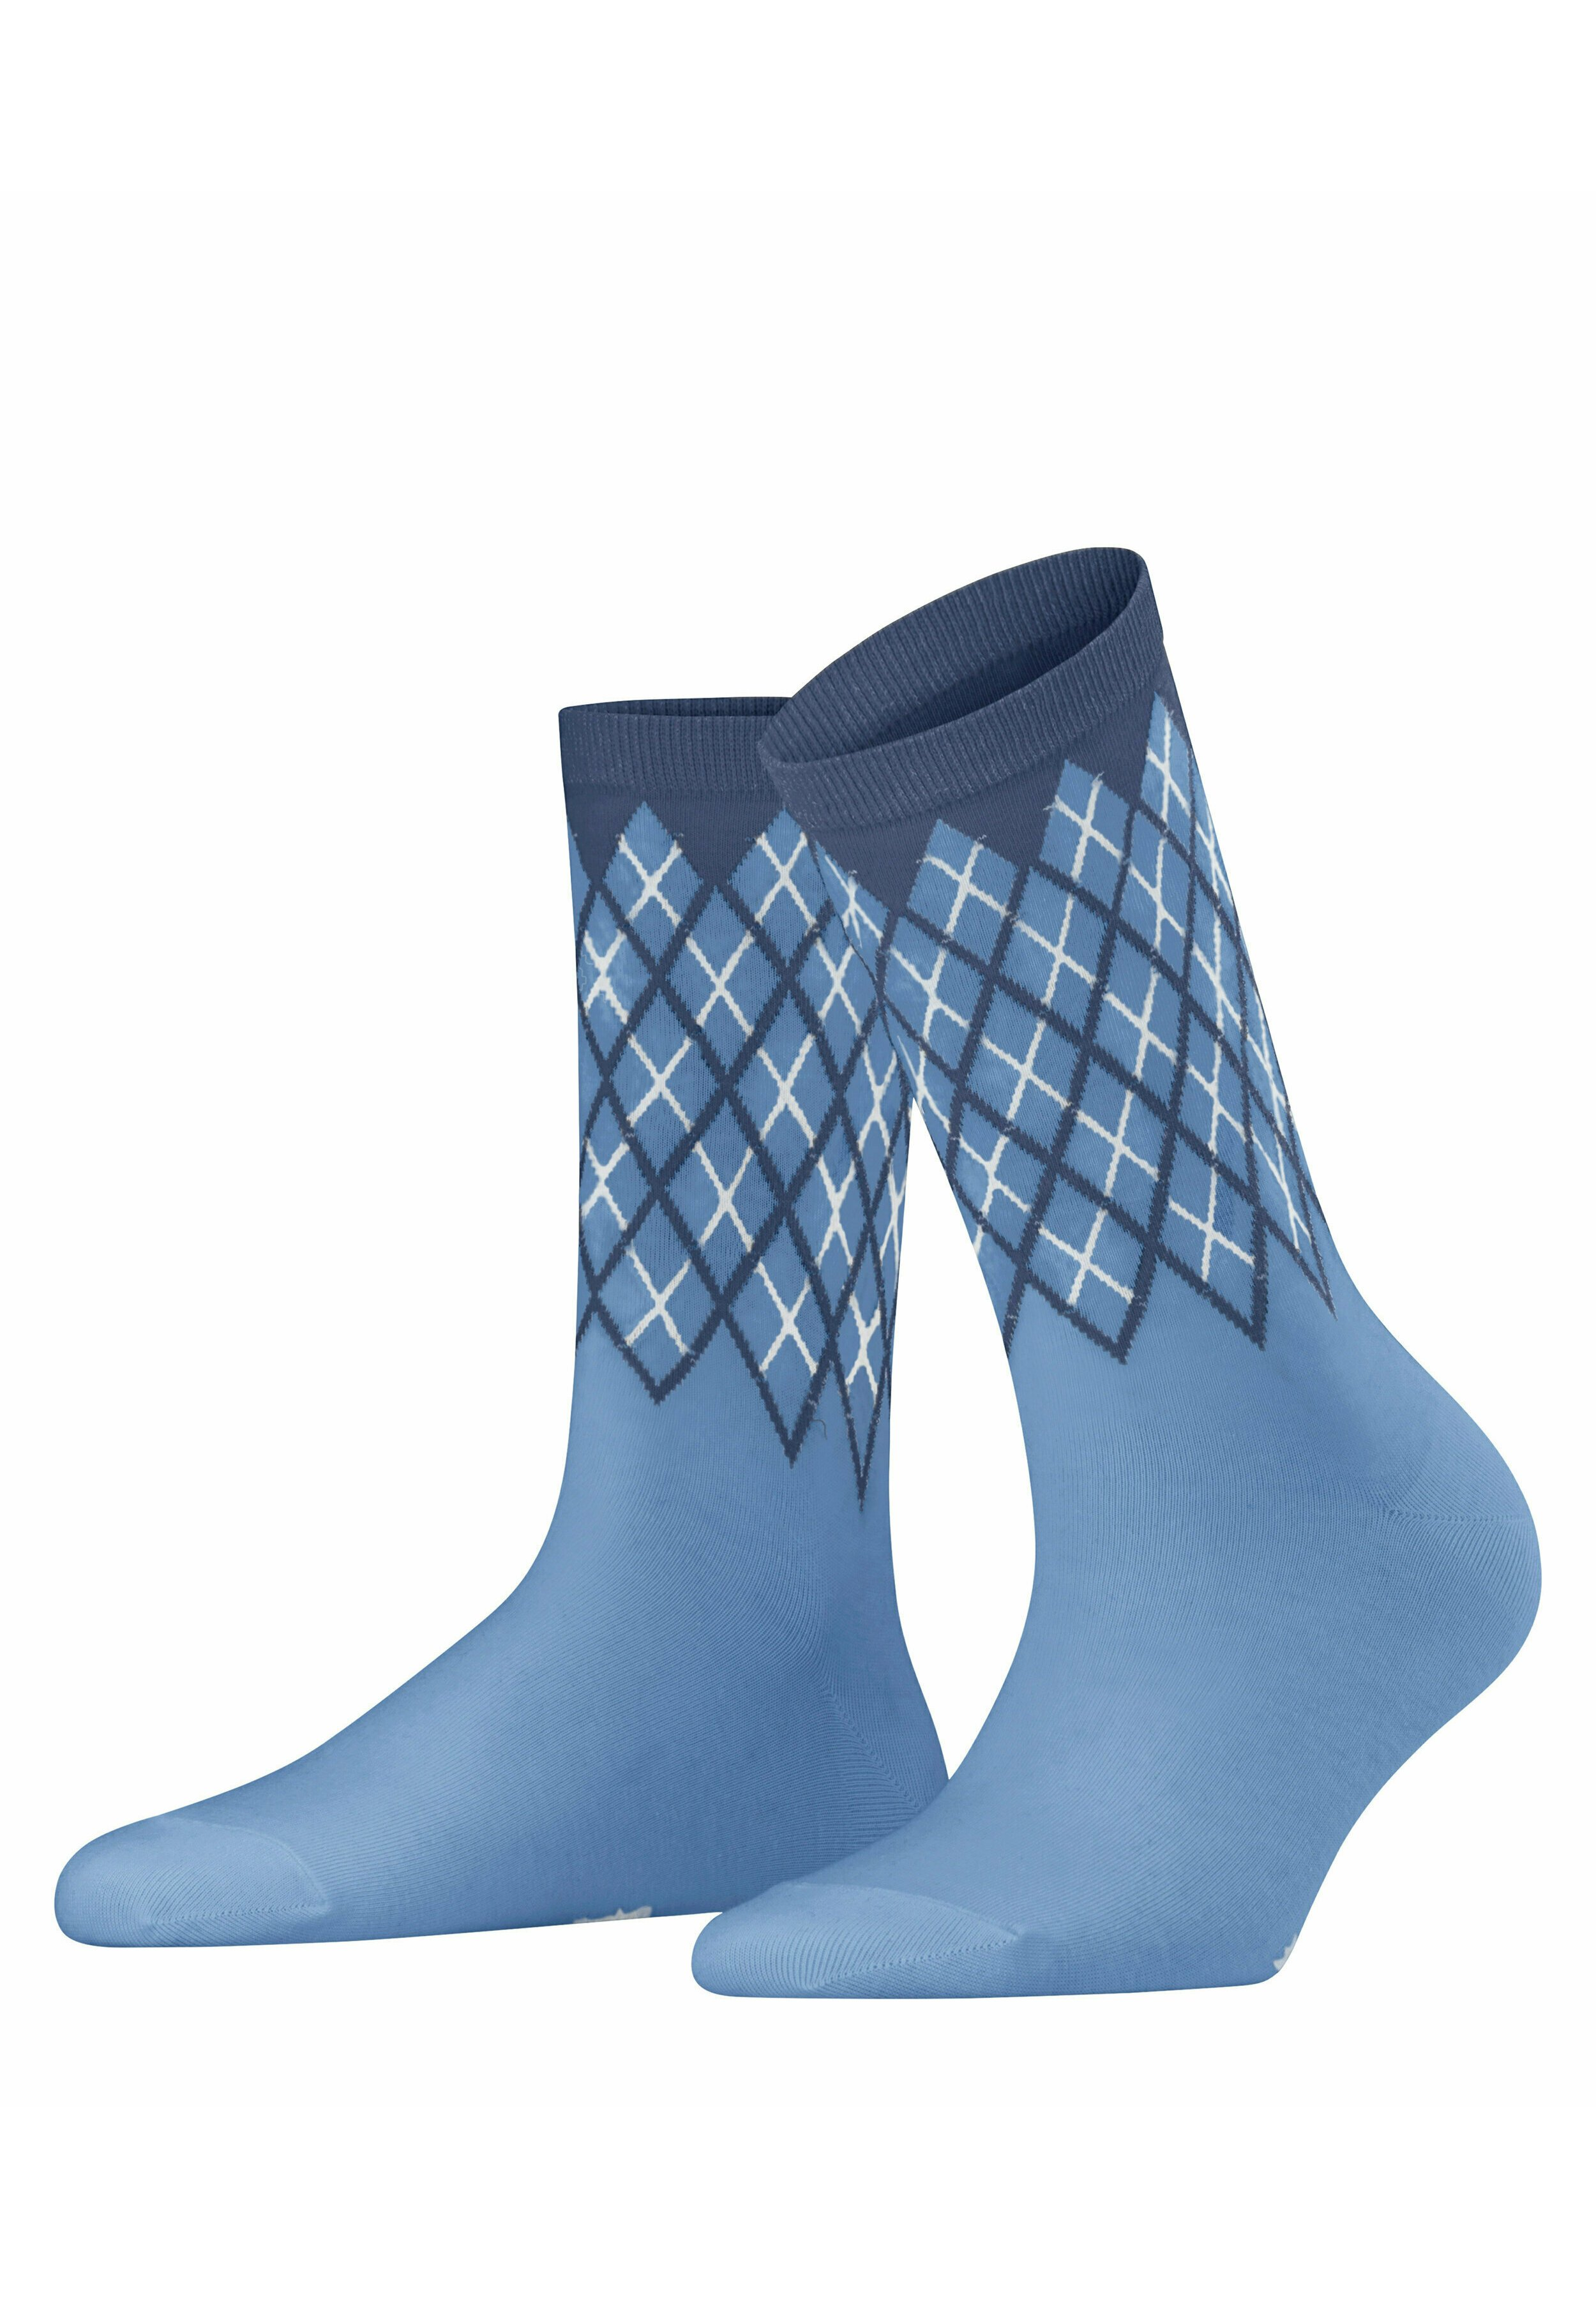 Femme Chaussettes - cornflower blue